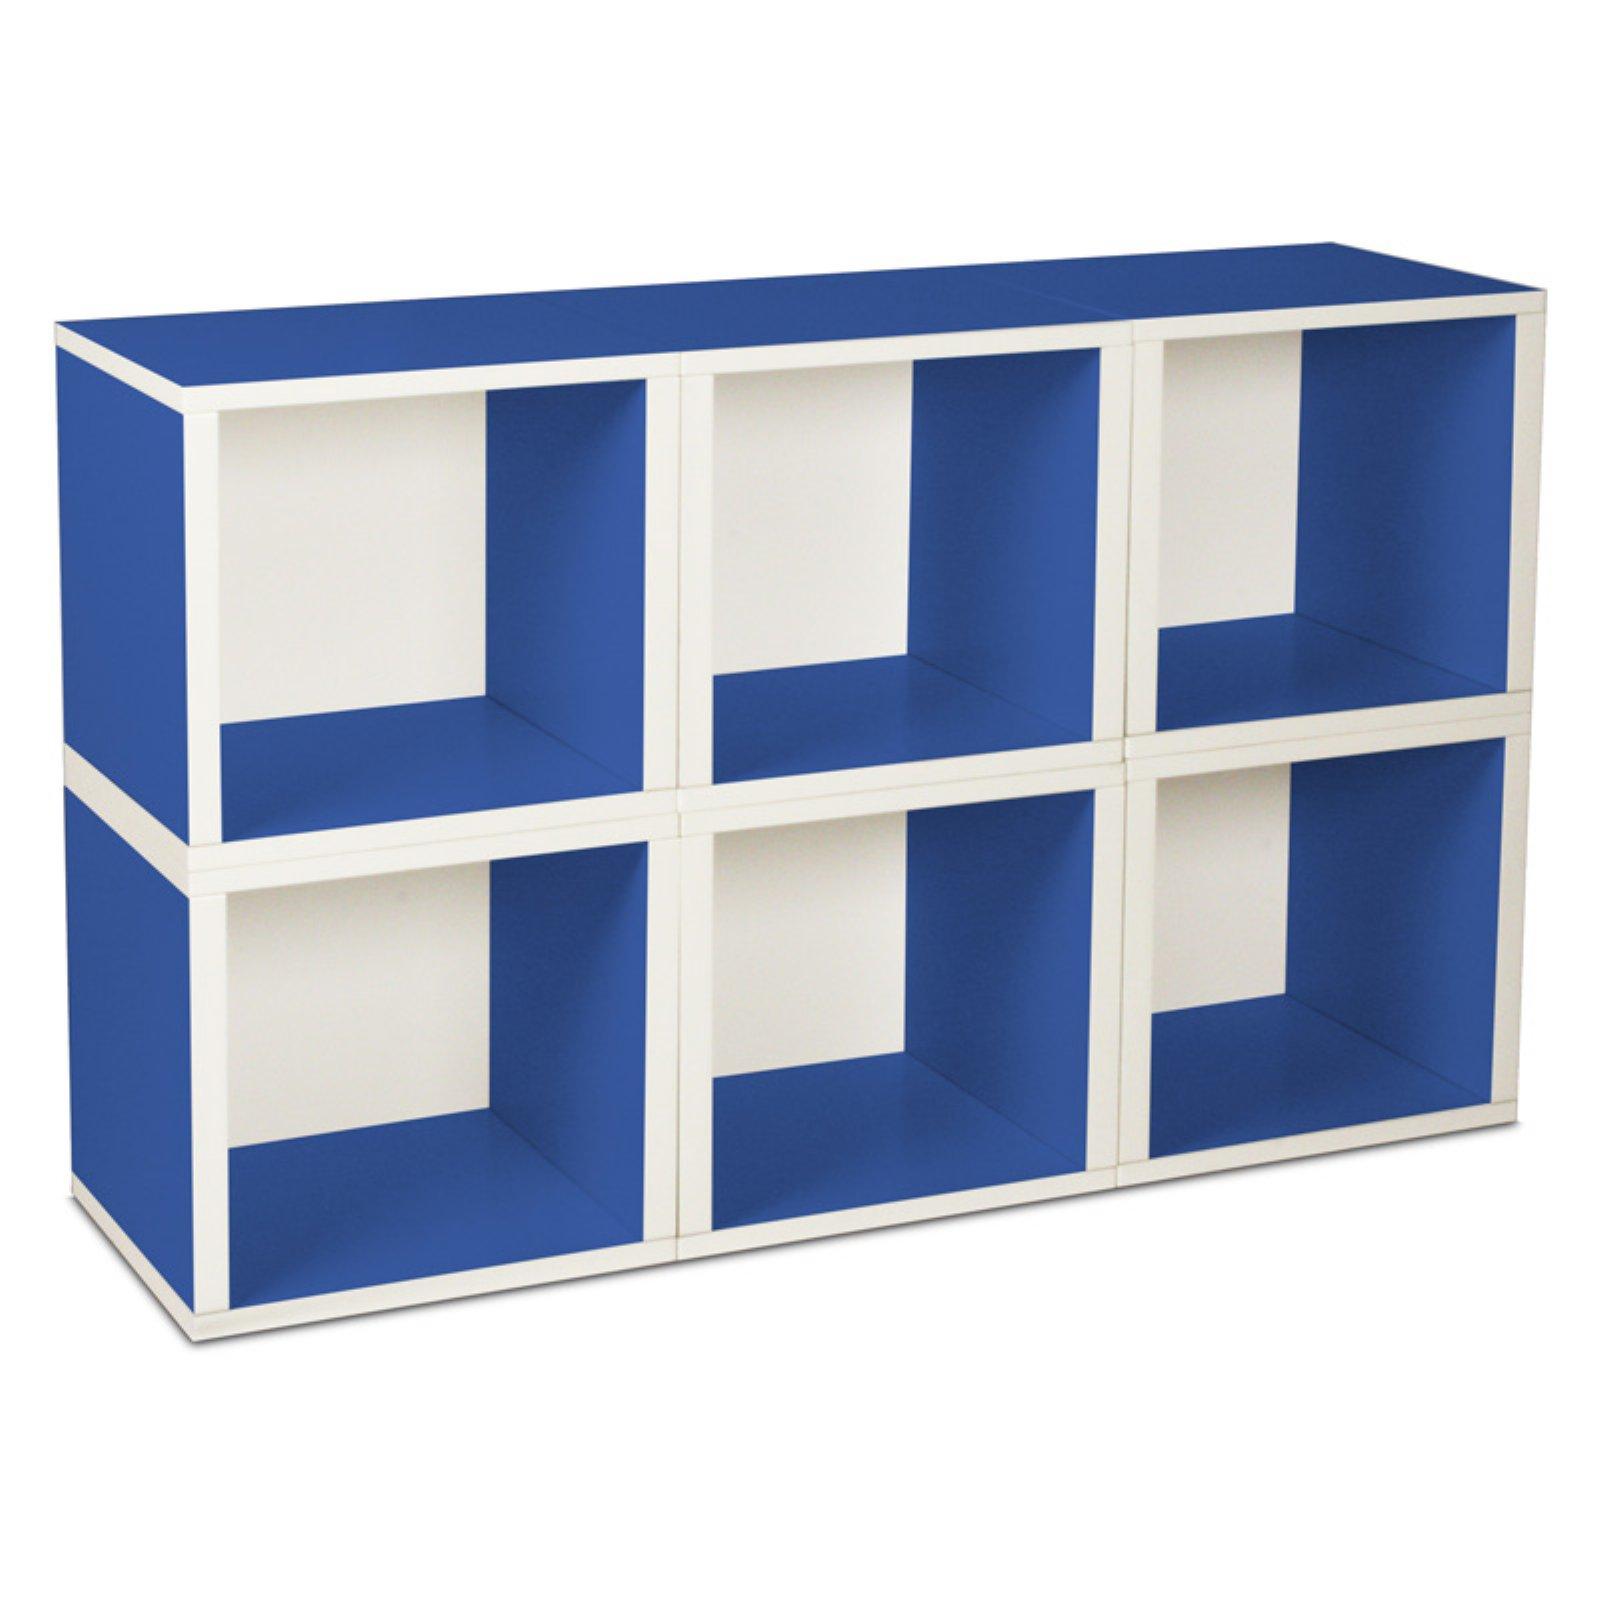 Way Basics Eco Stackable Modular Storage Cubes (6 Pack), Blue